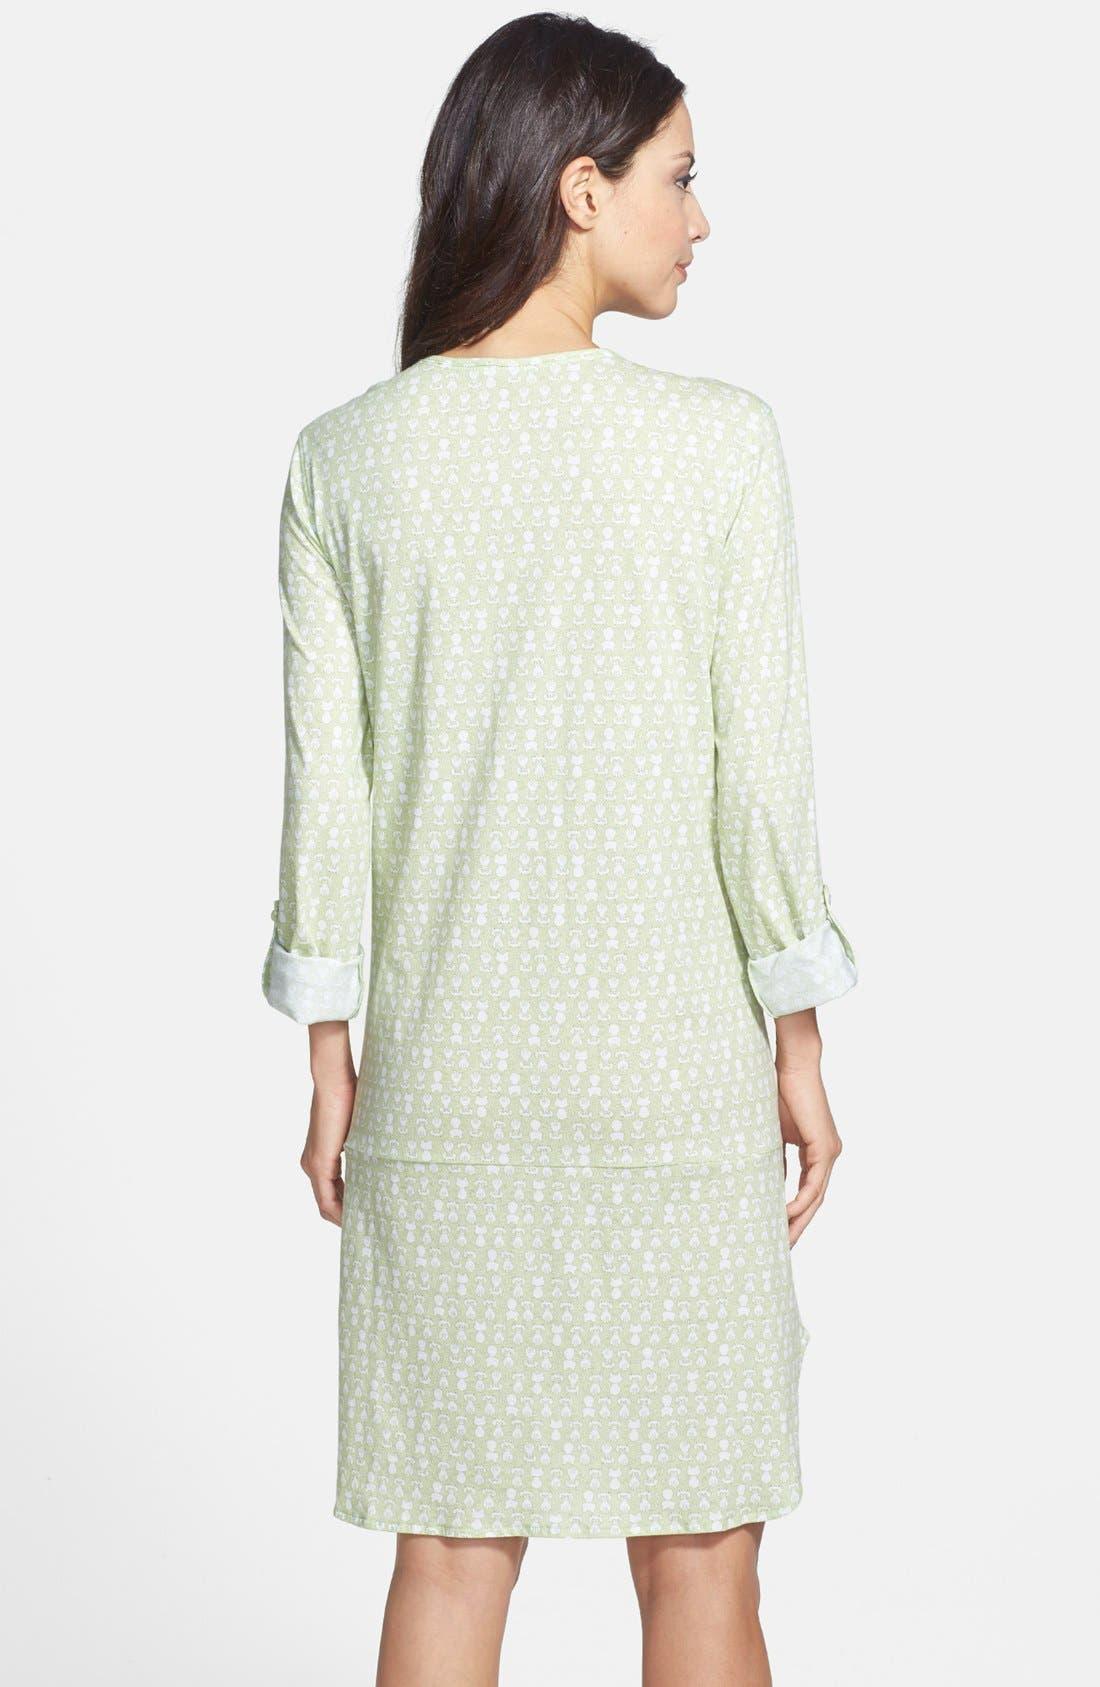 Alternate Image 2  - Carole Hochman Designs 'Radiant Dots' Sleep Shirt